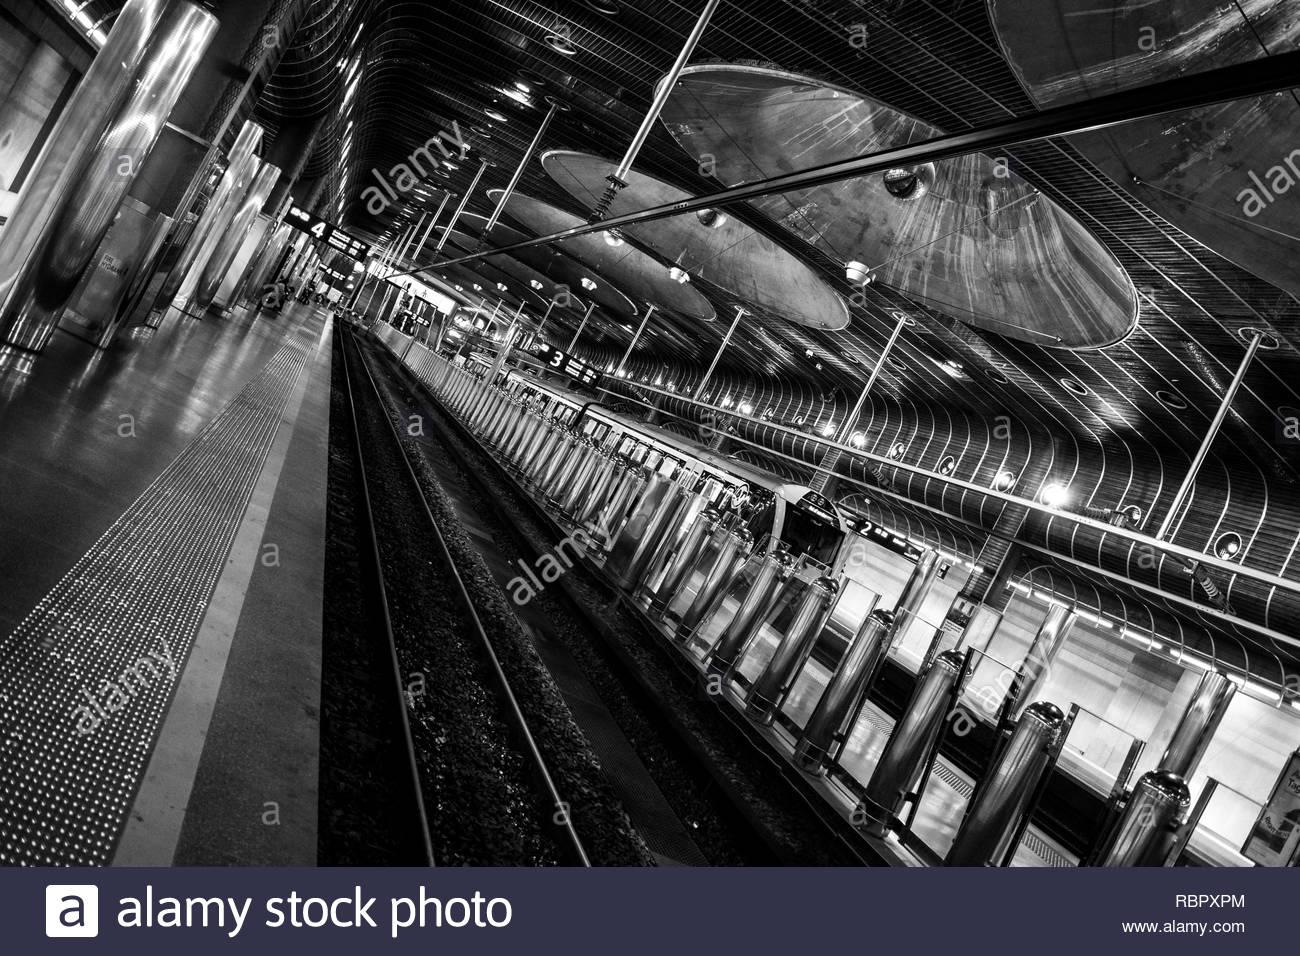 Britomart Train Station - Stock Image